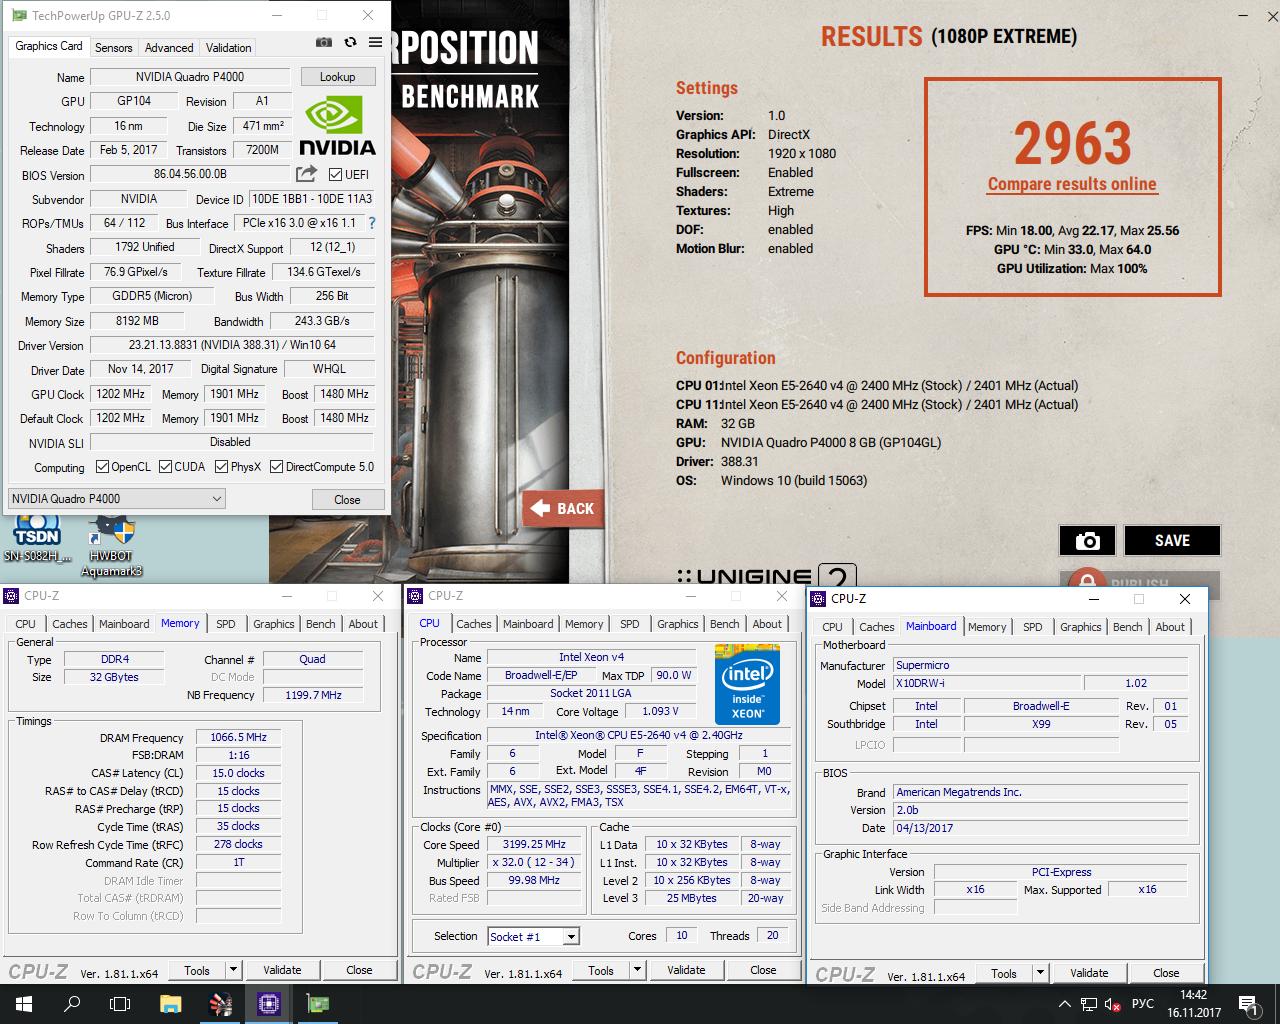 StingerYar`s Unigine Superposition - 1080P Xtreme score: 2963 Points